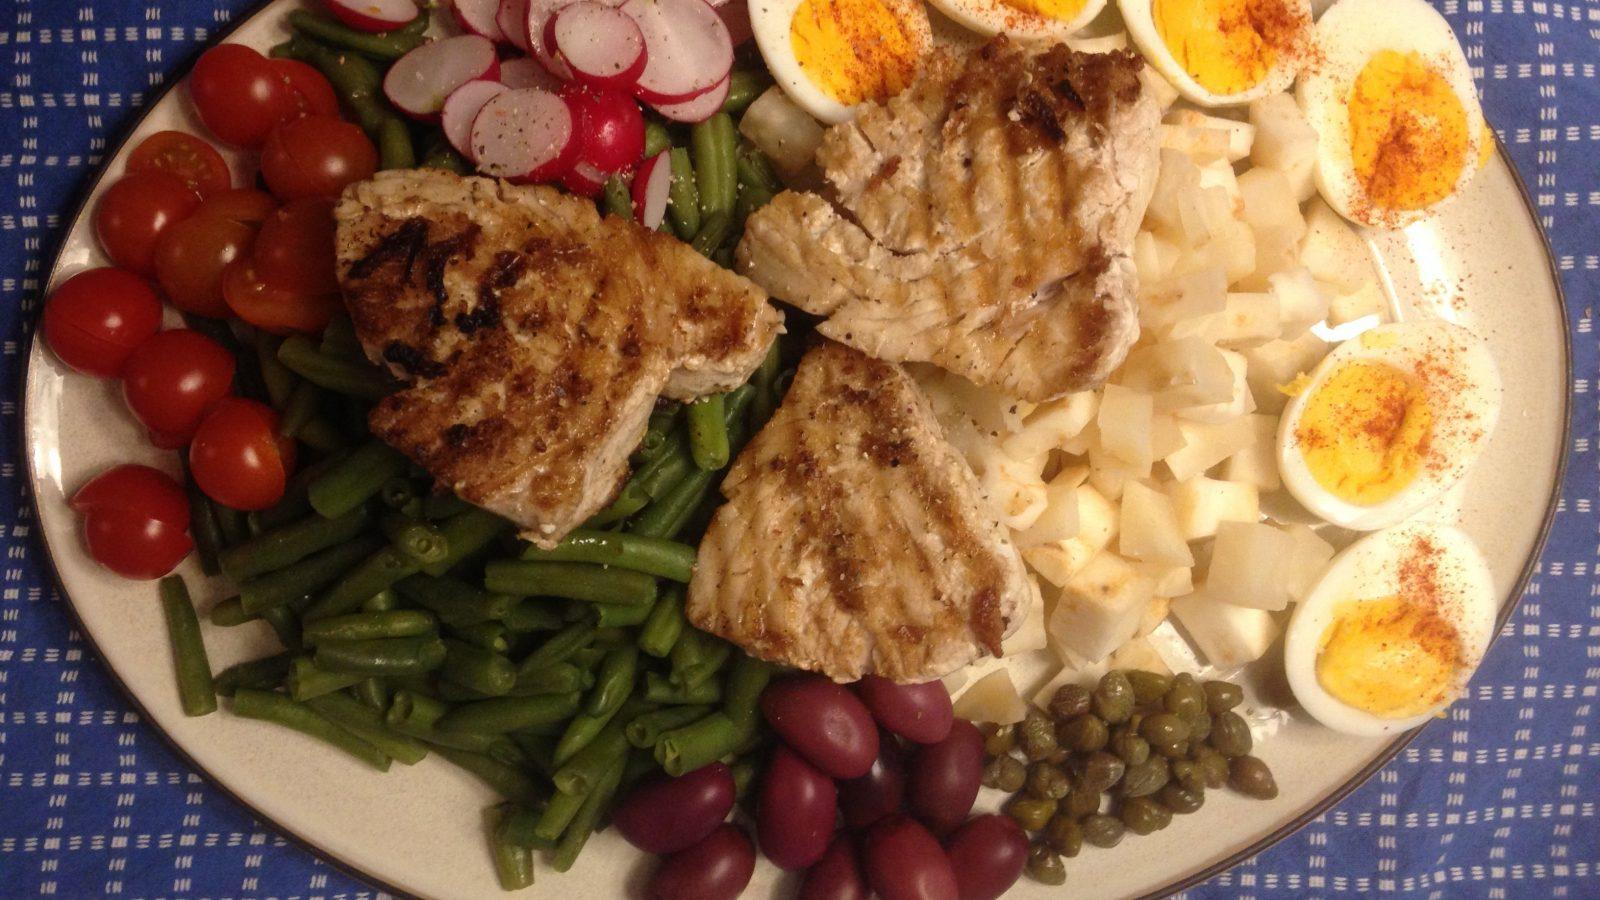 Keto salade Nicoise